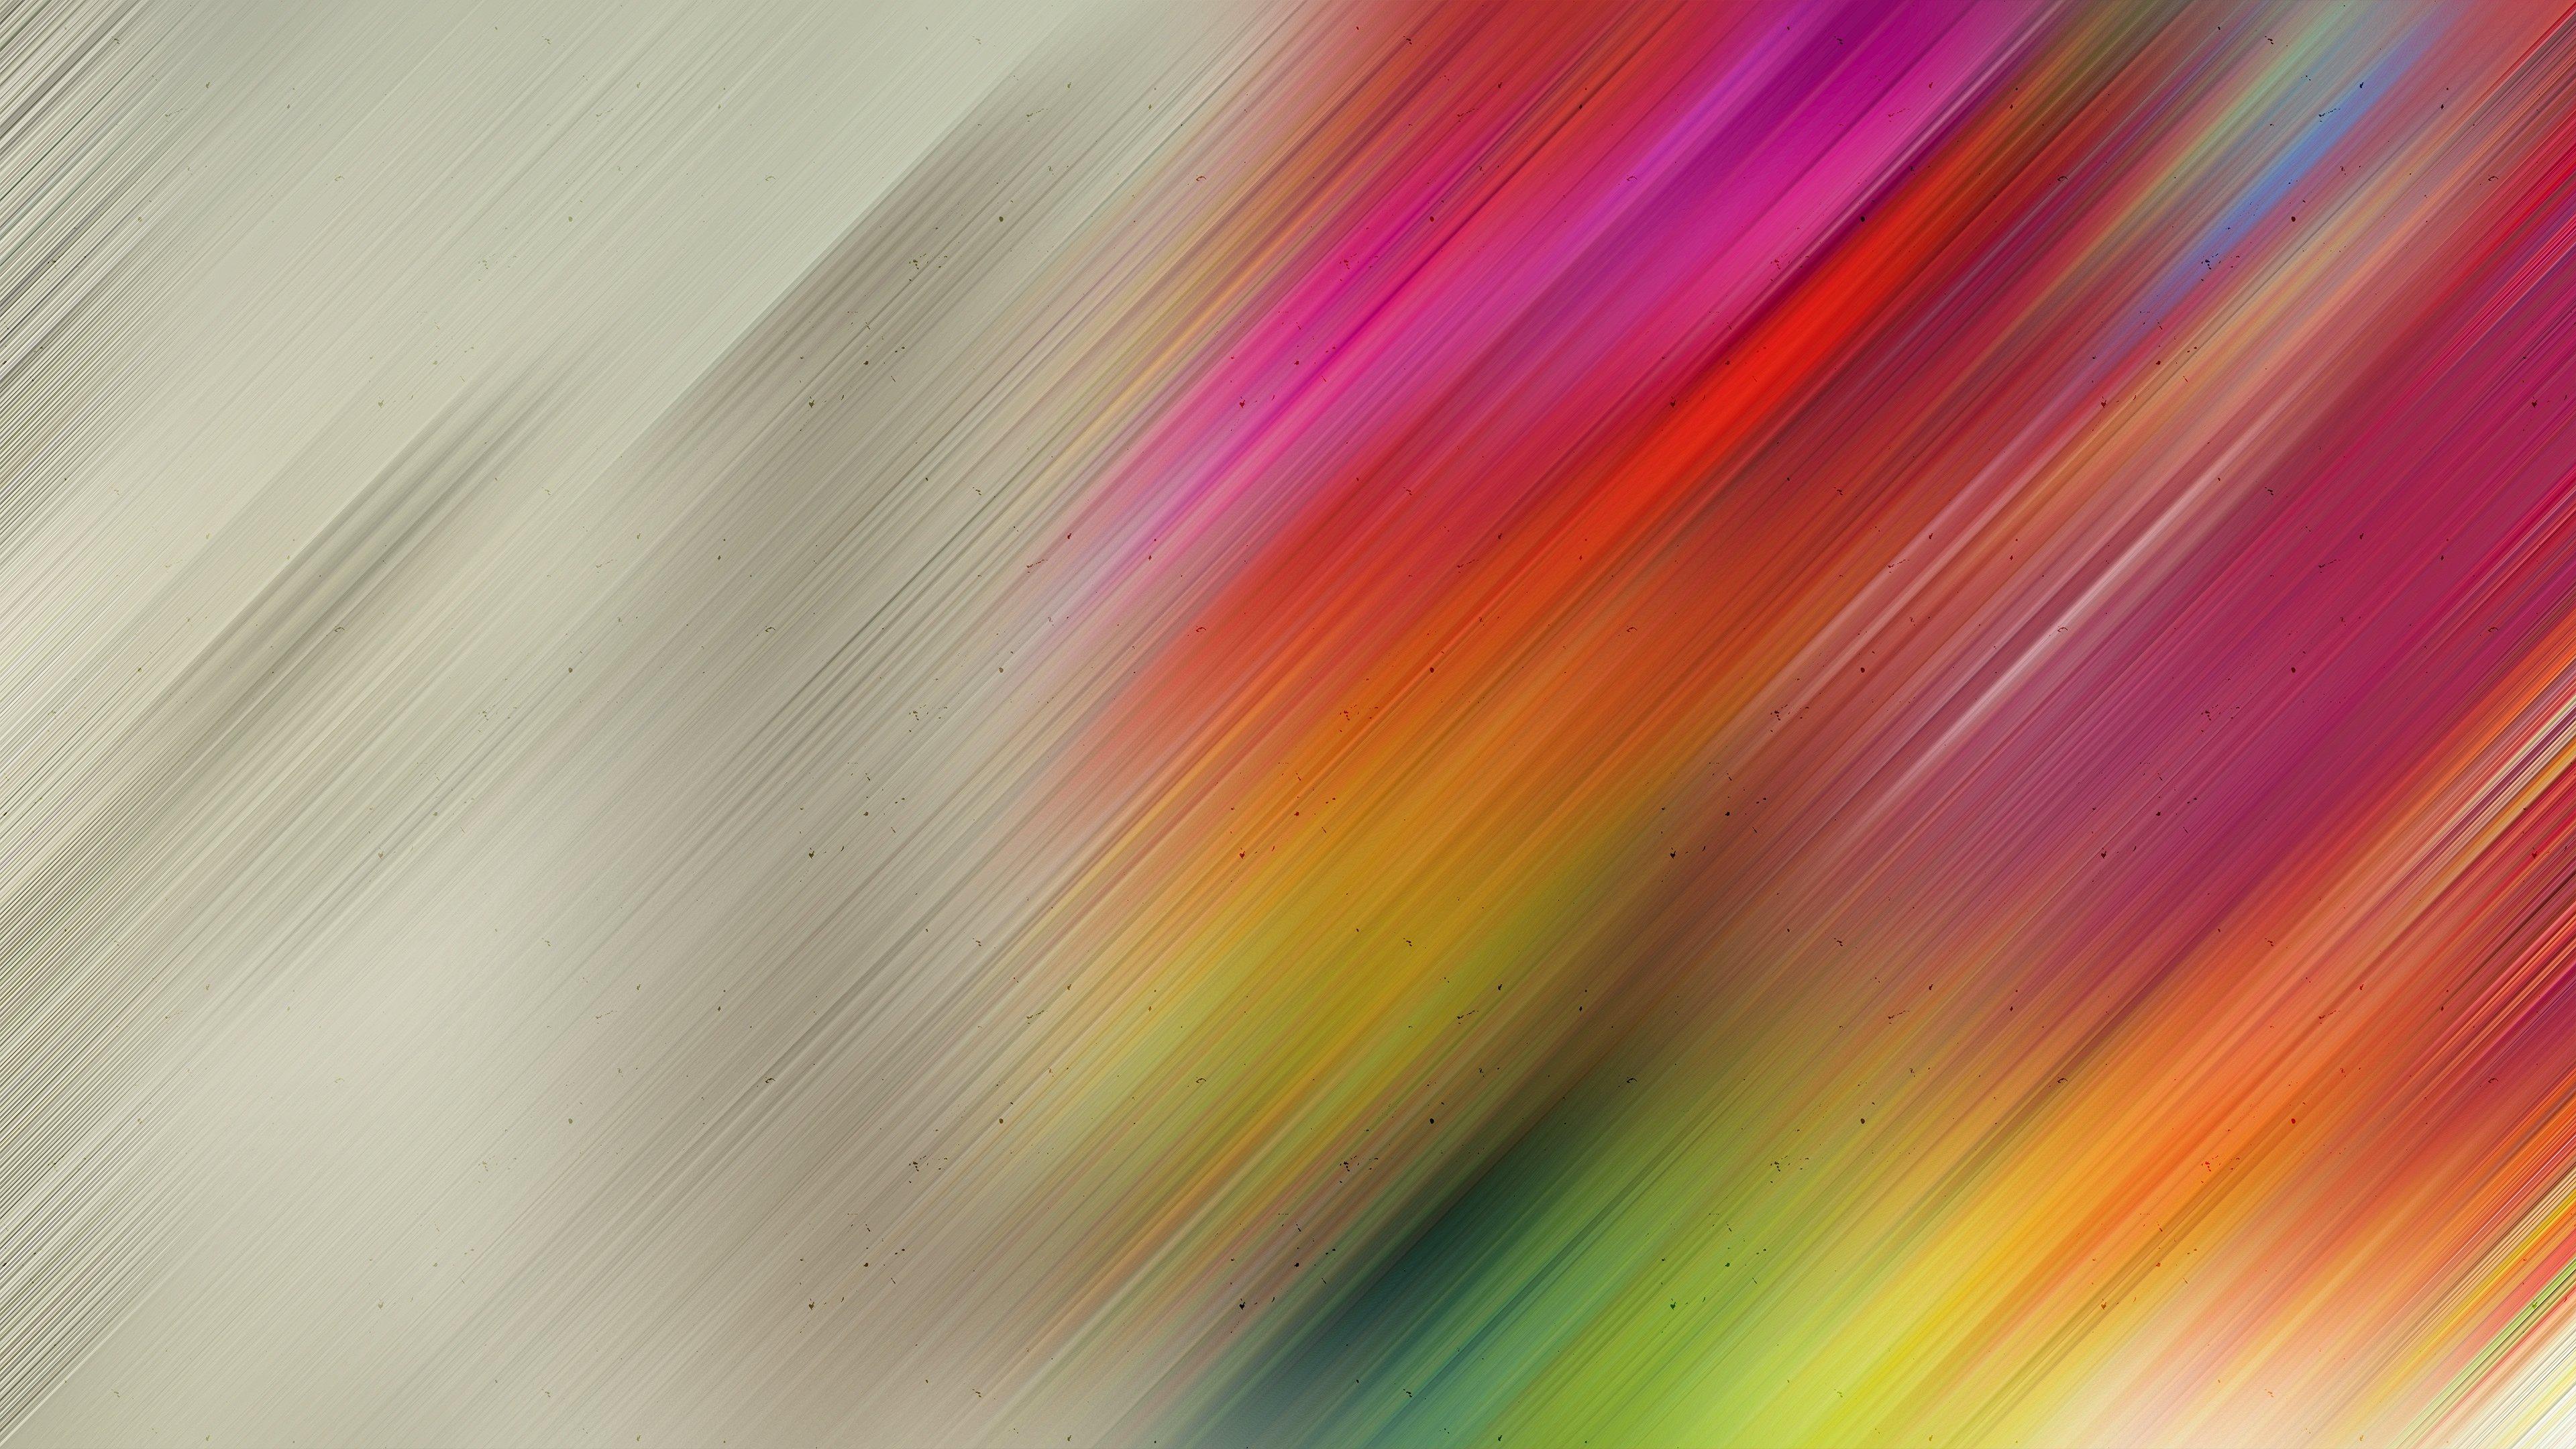 Fondos de pantalla Colores borrosos abstractos